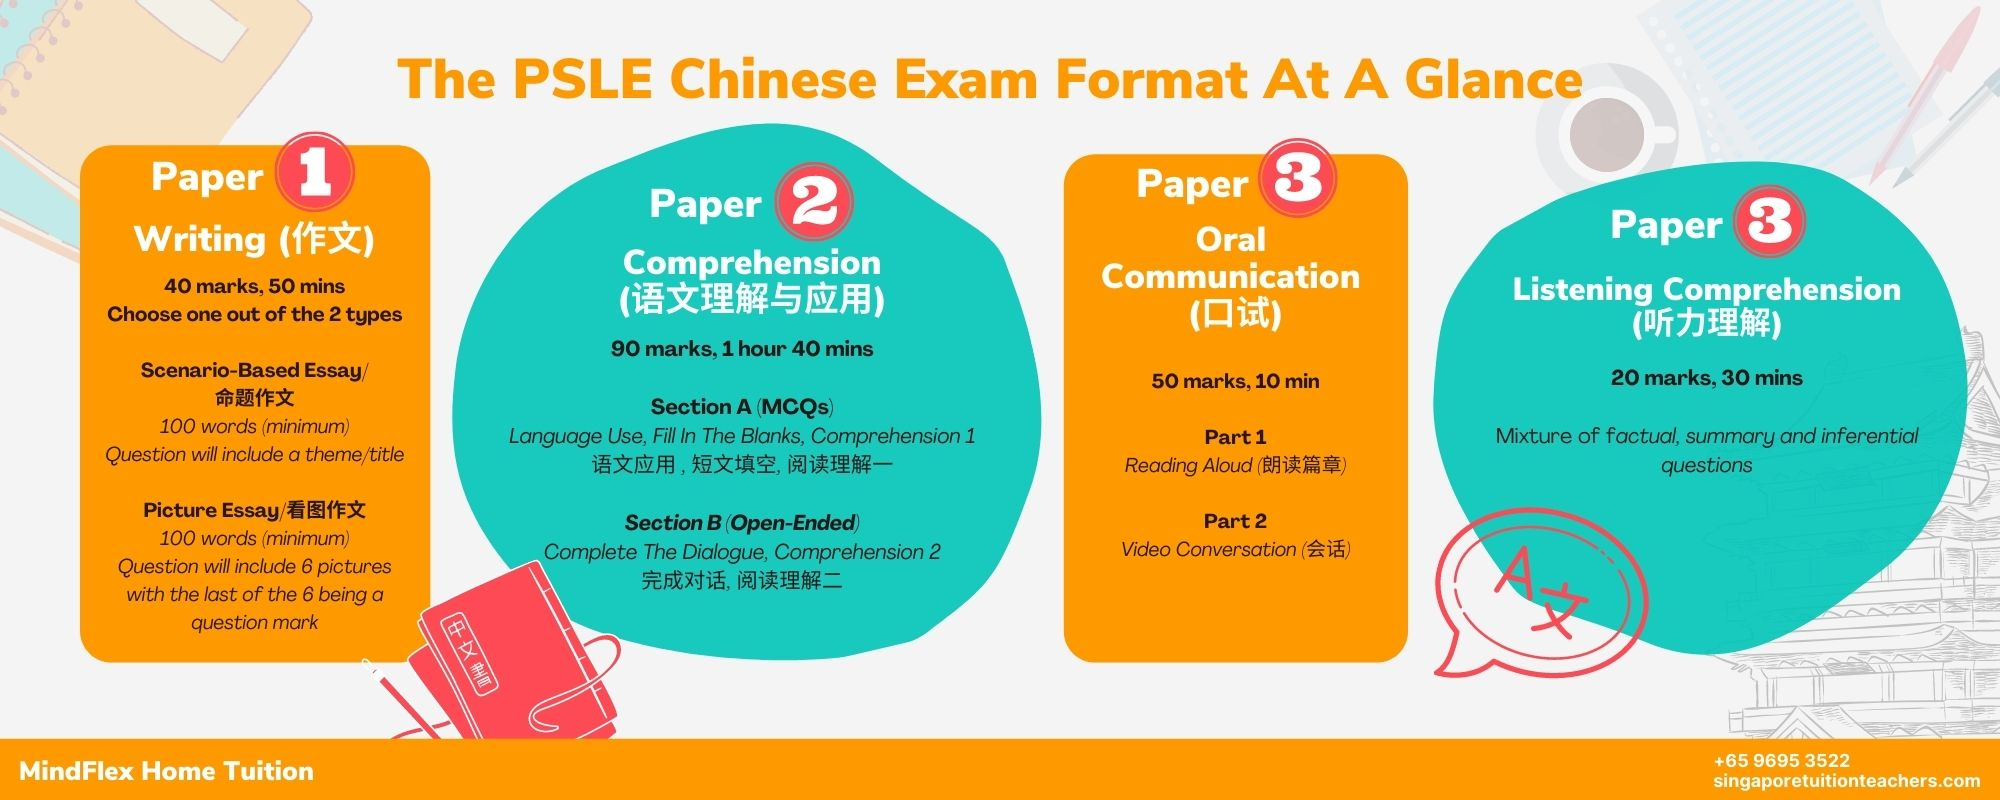 PSLE Chinese Exam Format